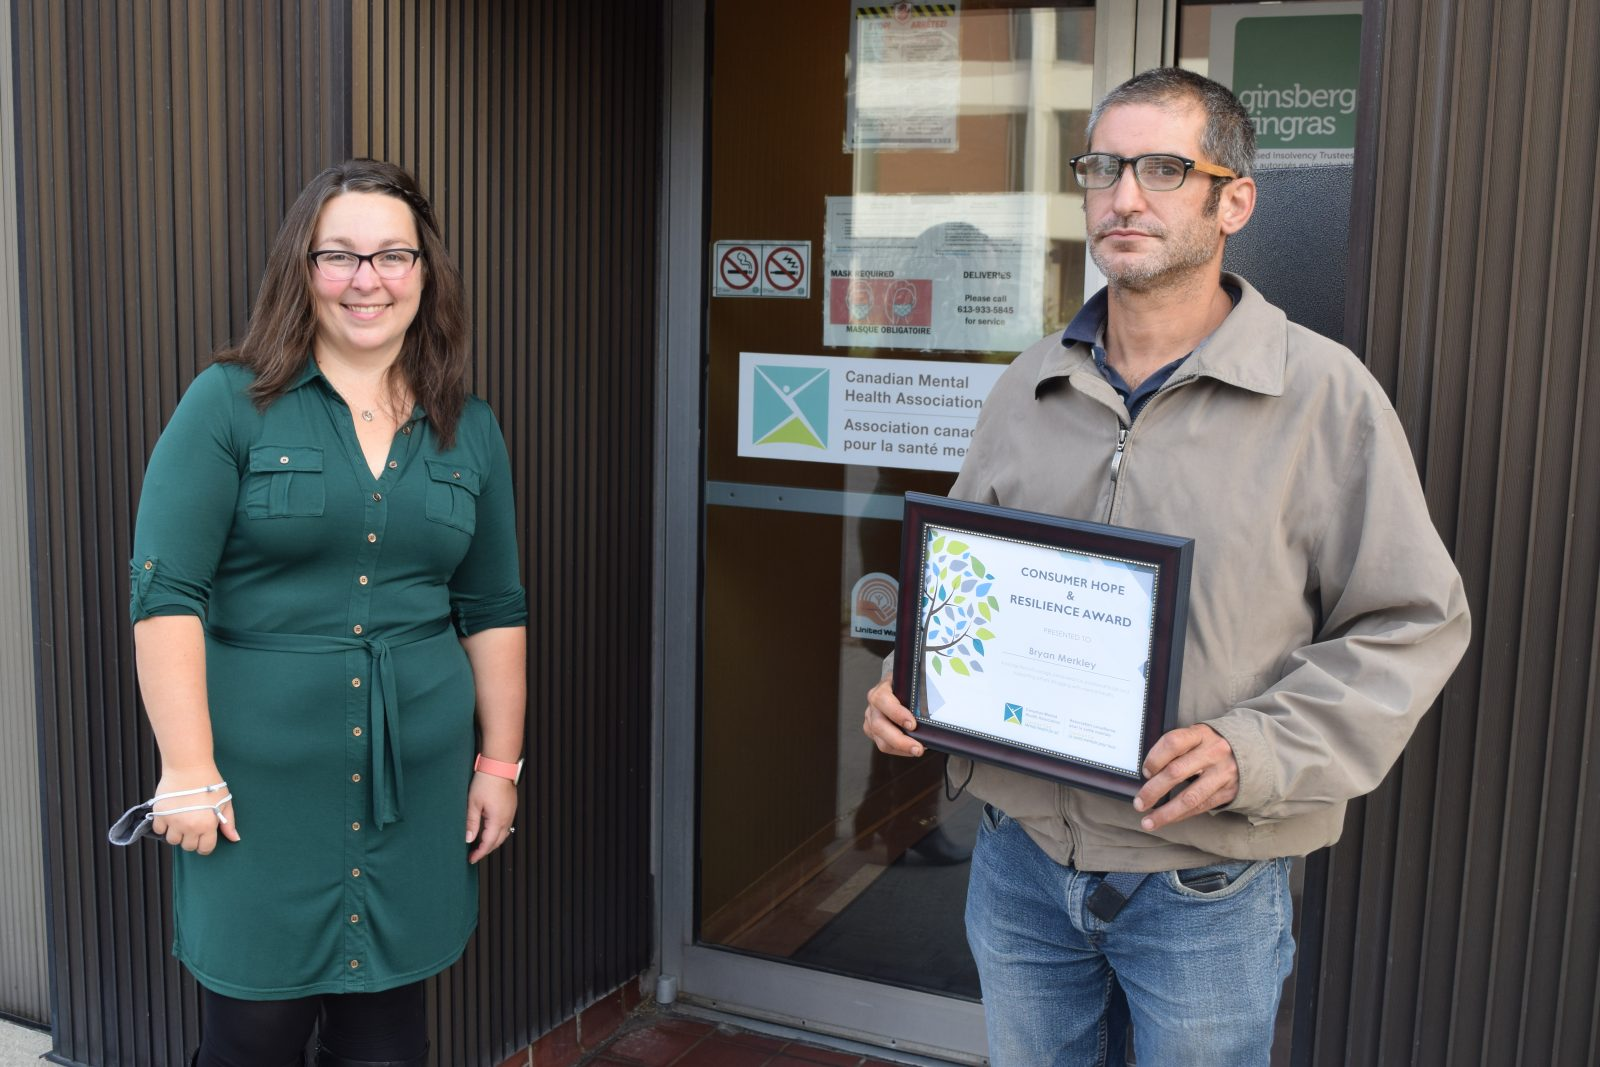 CMHA Consumer Hope & Resilience Award winner announced